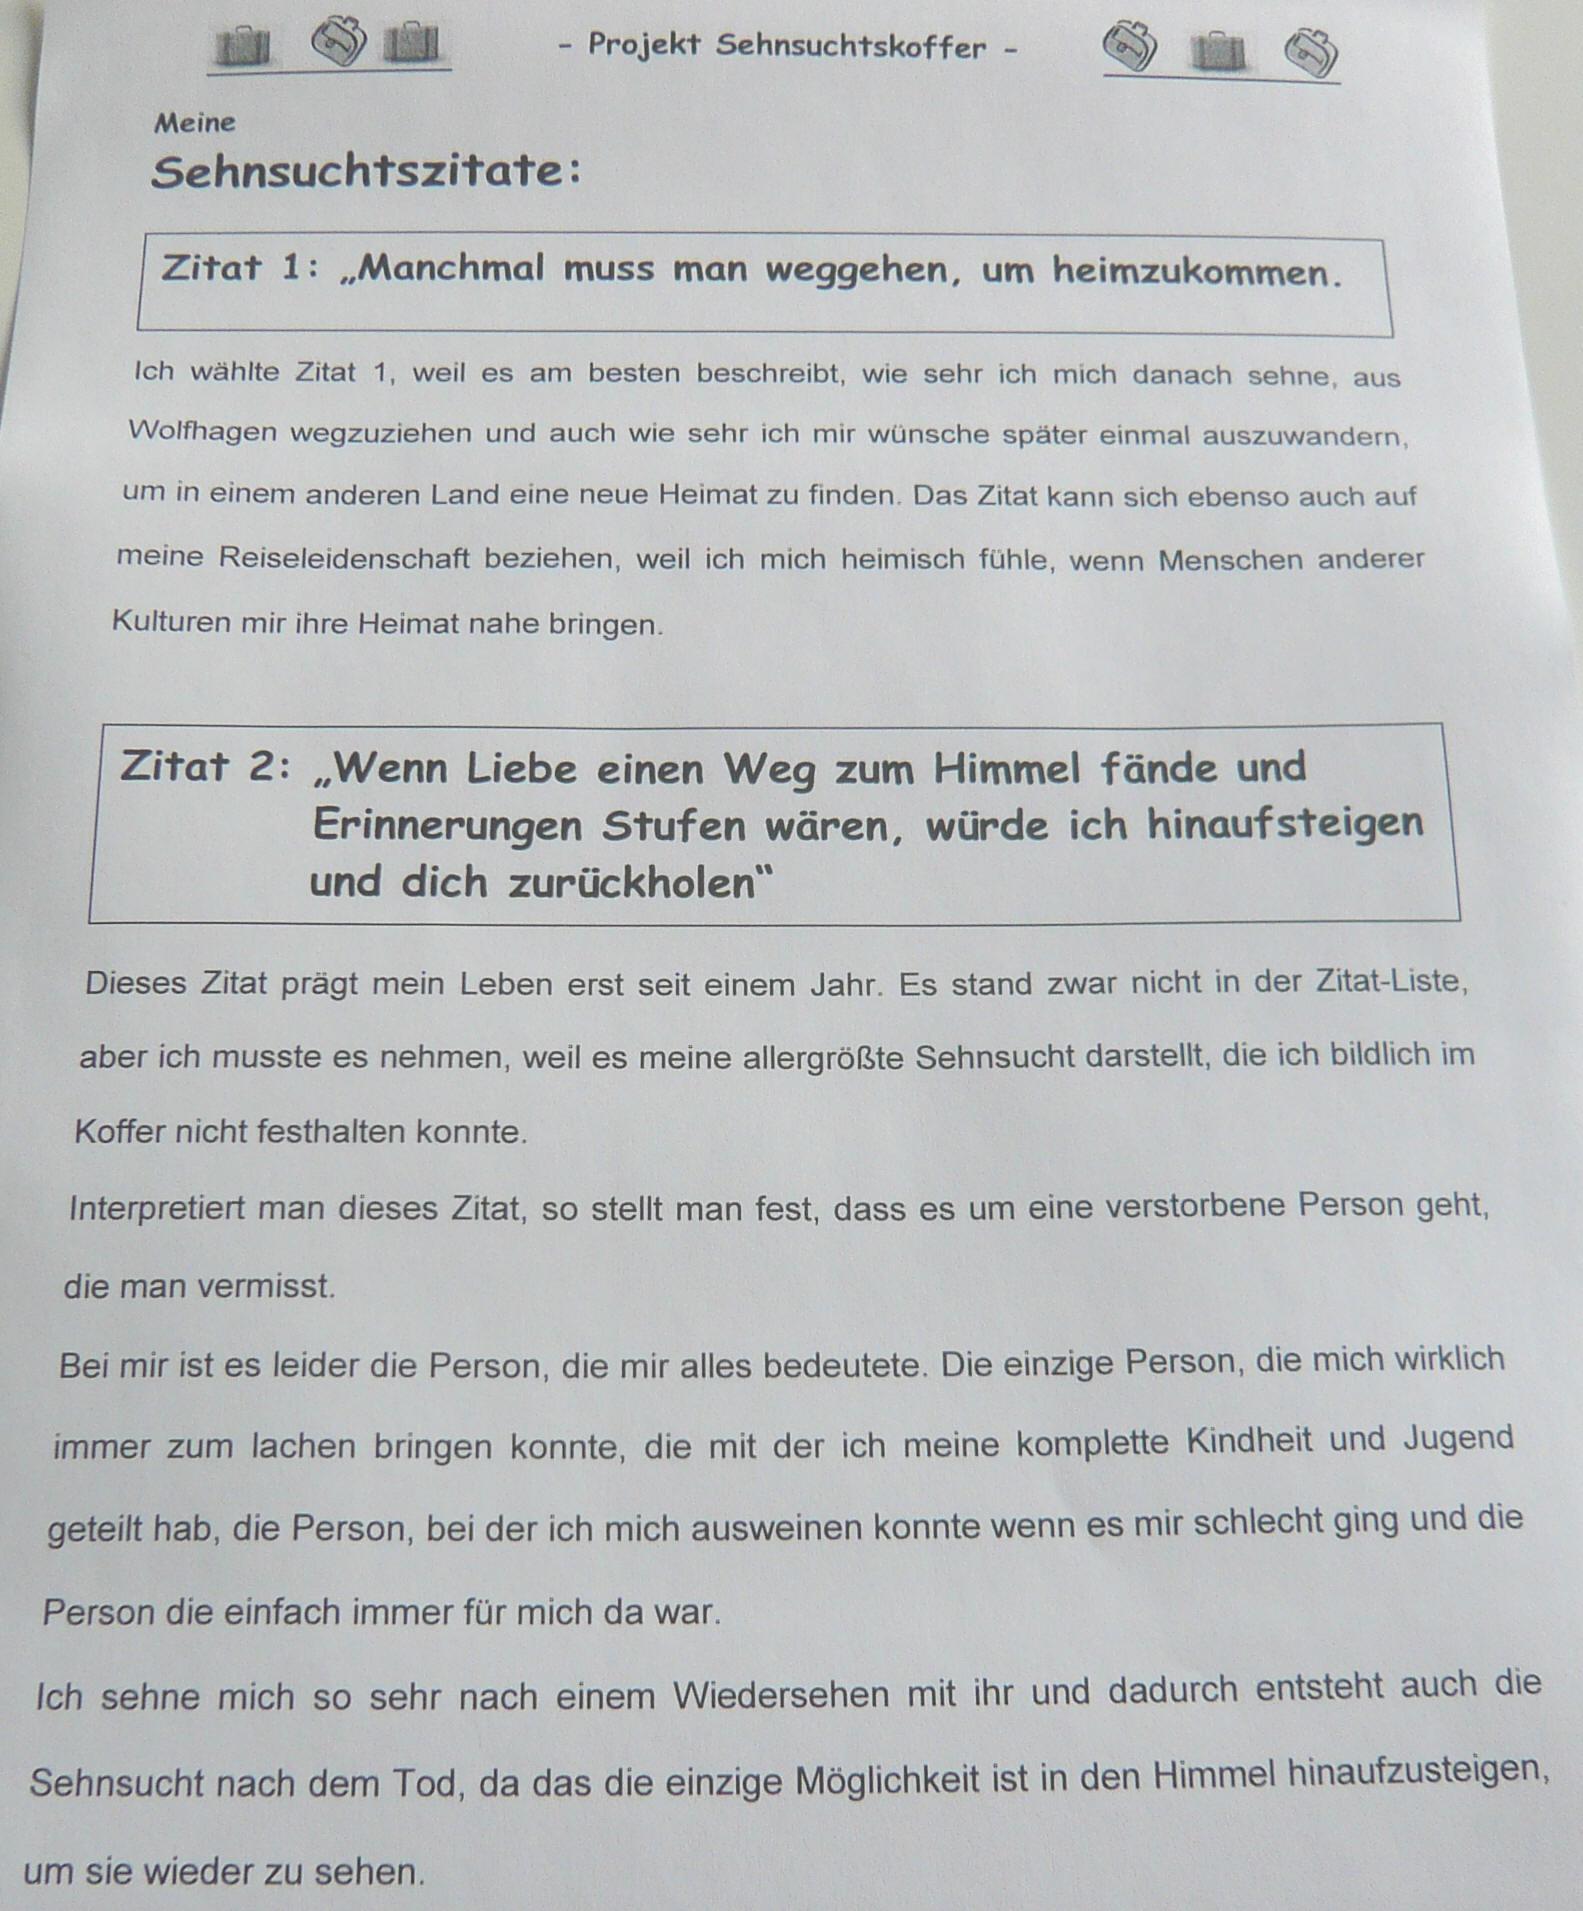 Awesome Julius Caesar Zitate Arbeitsblatt Antworten Image ...